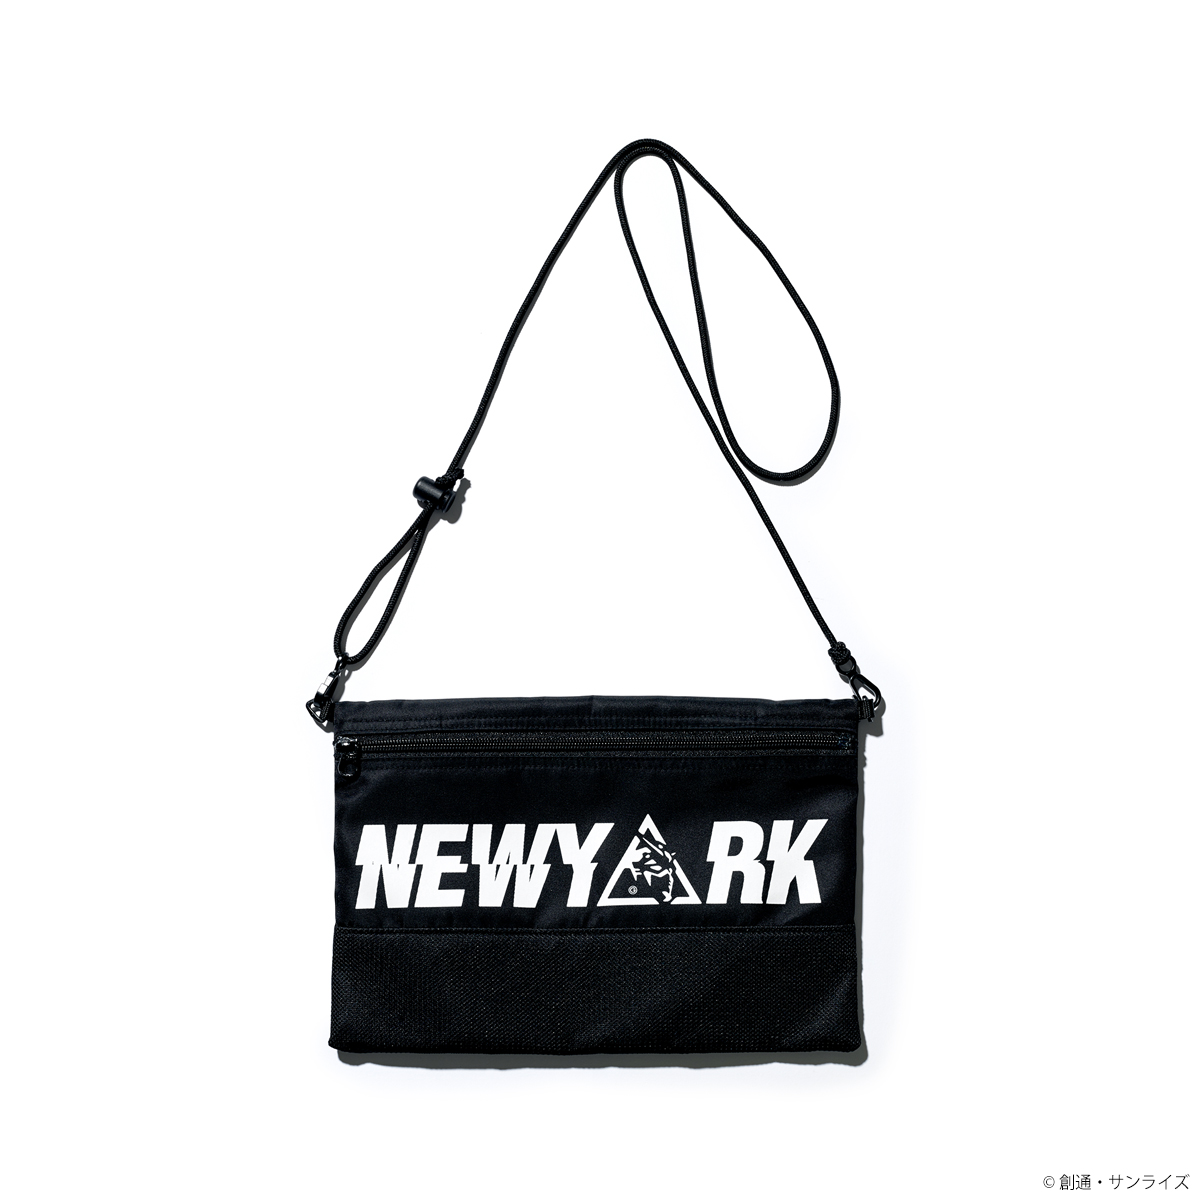 STRICT-G NEW YARK 側腰包